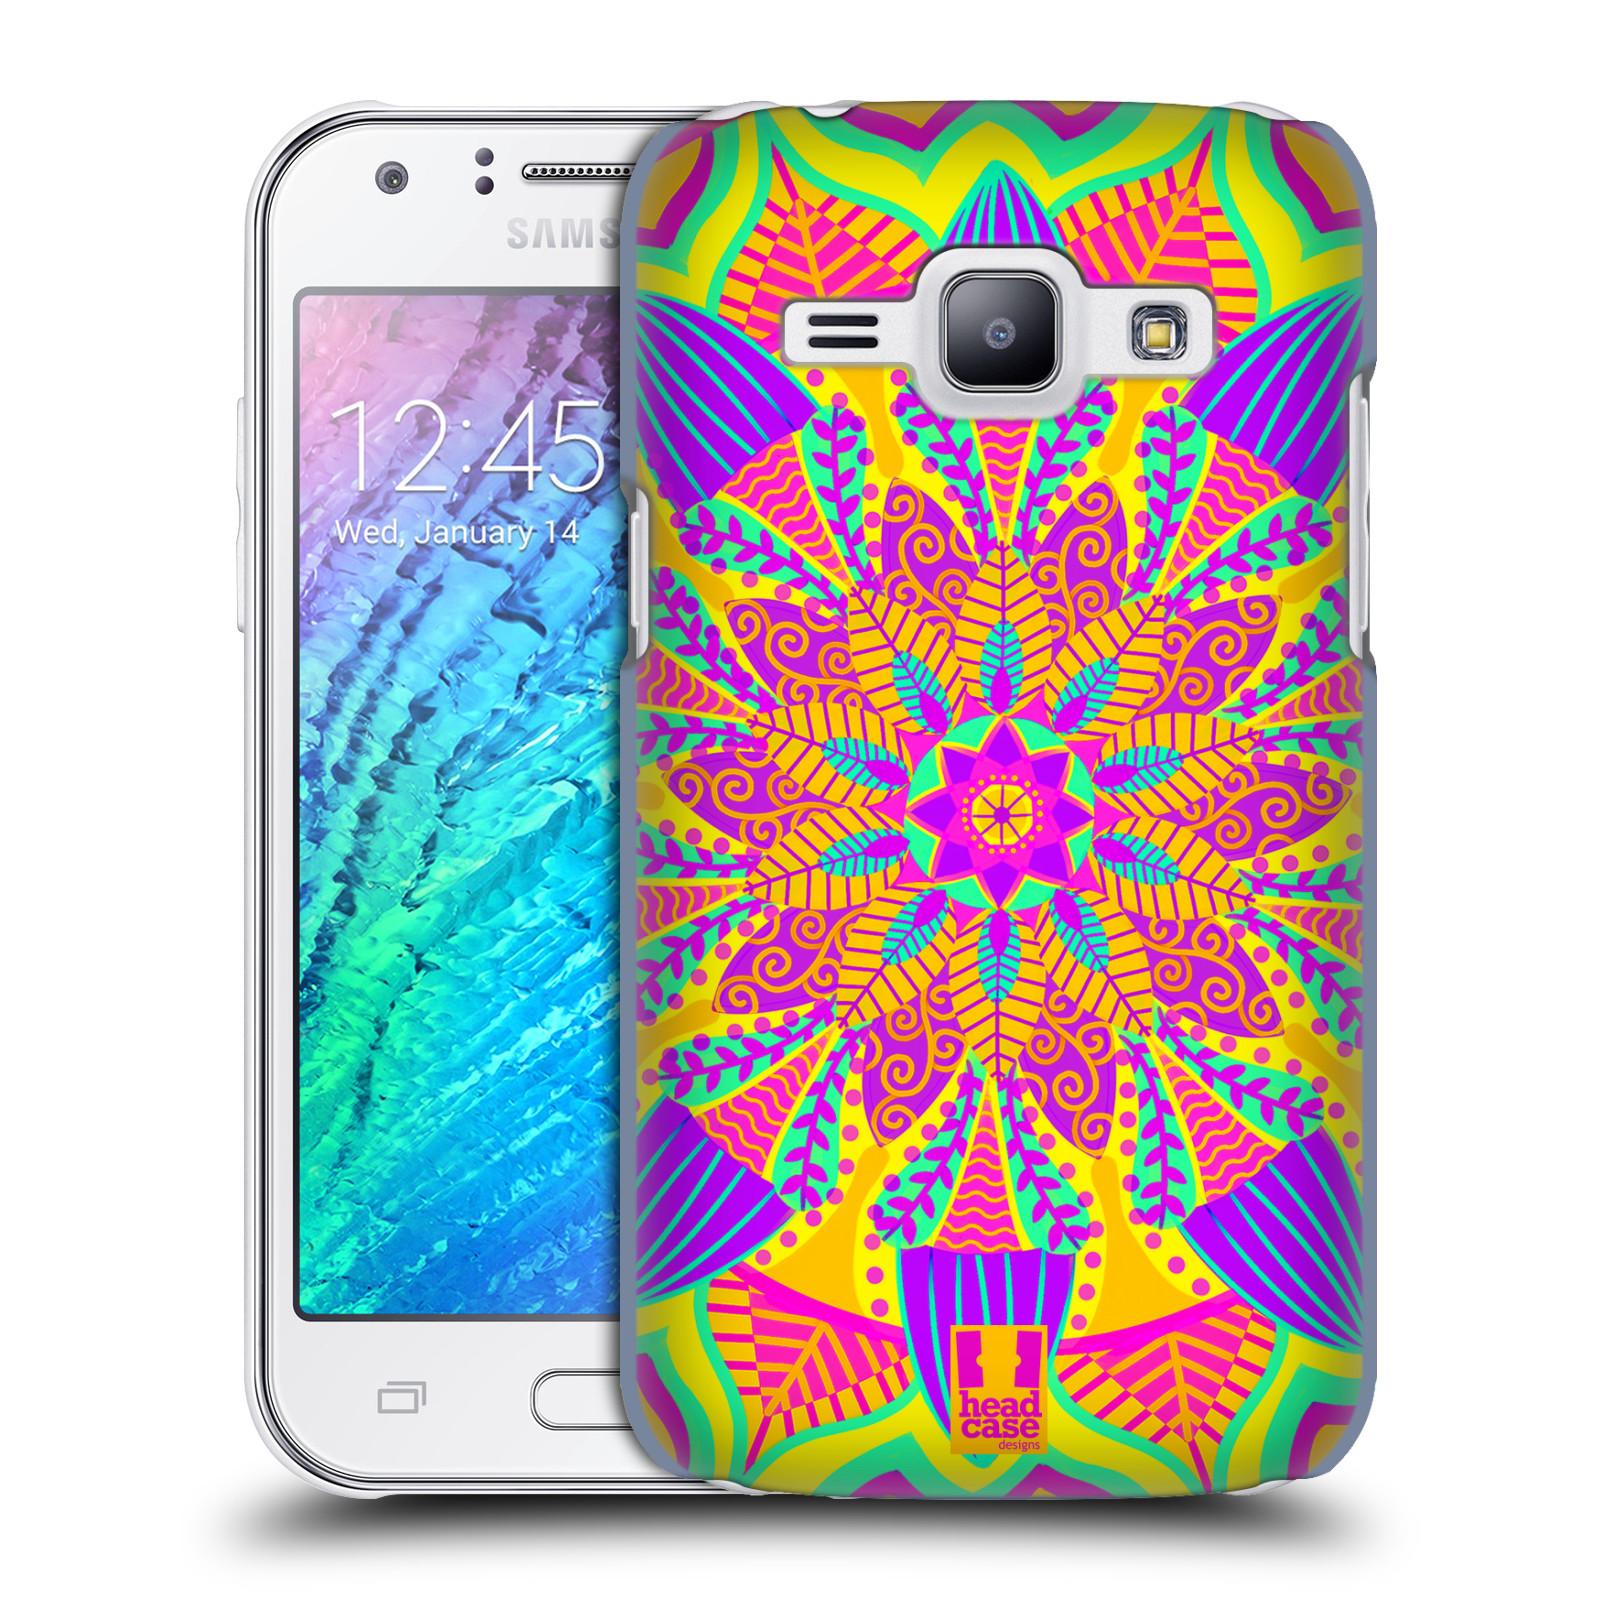 HEAD CASE plastový obal na mobil SAMSUNG Galaxy J1, J100 vzor Indie Mandala květinový motiv VÝCHOD SLUNCE LIMETKOVÁ